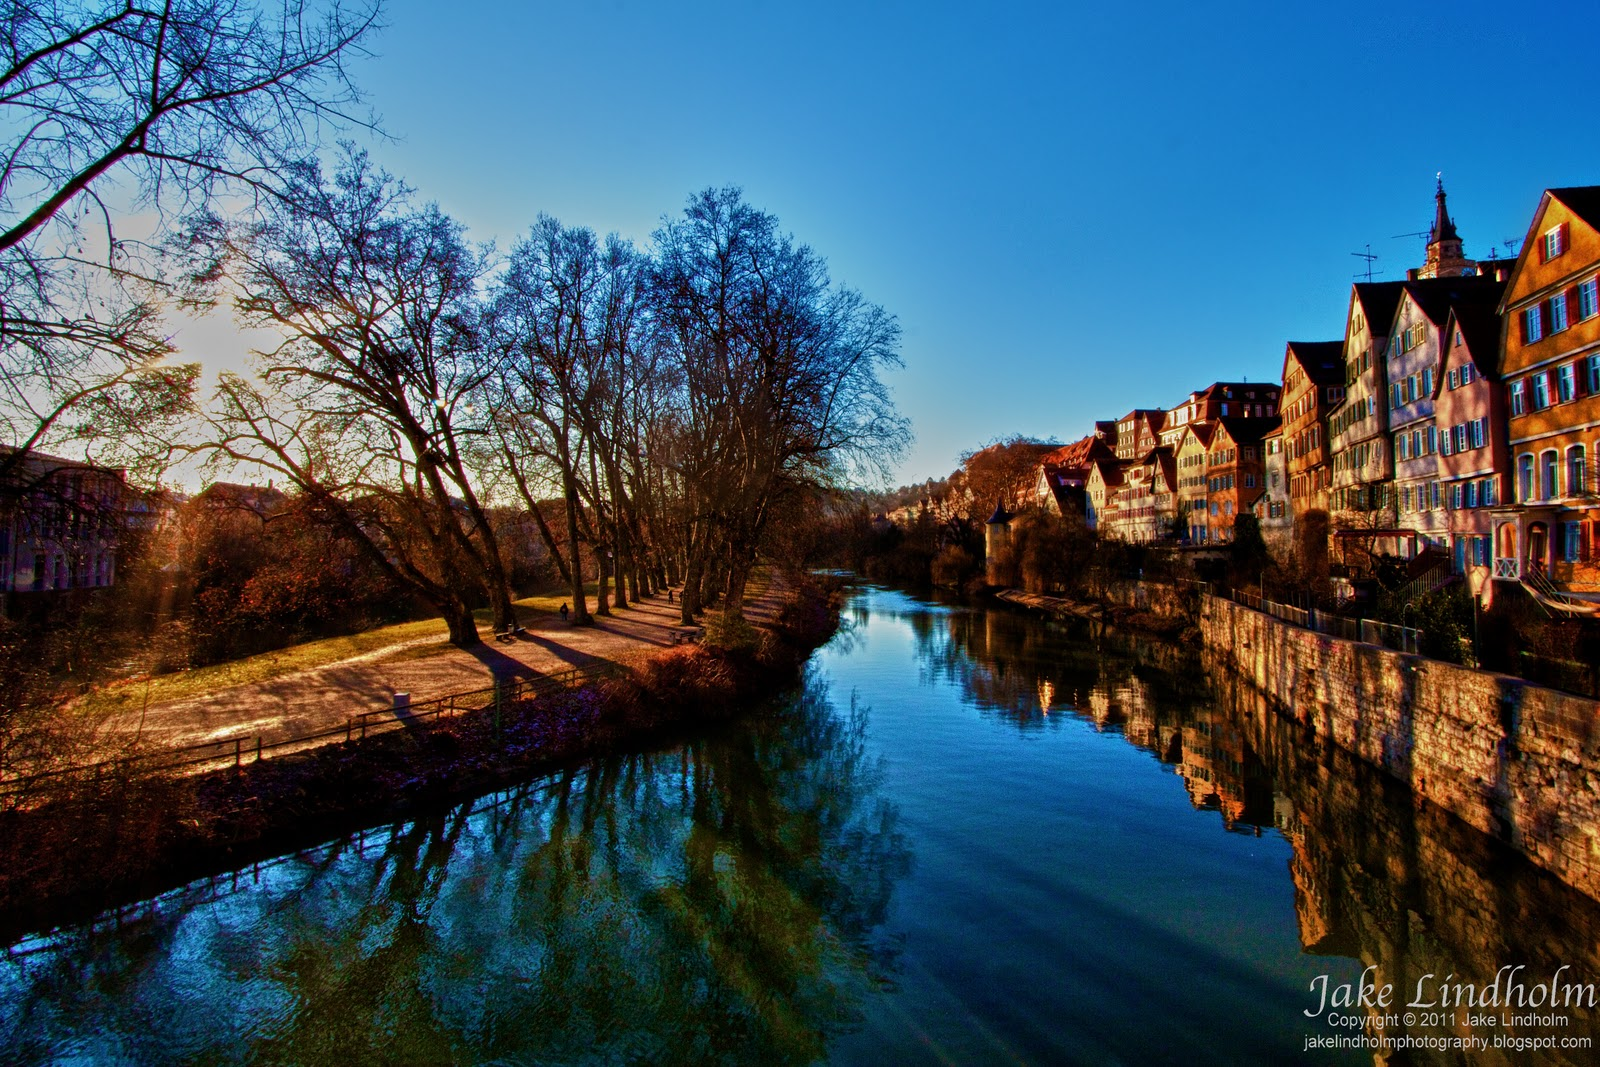 Garden Of The Gods Colorado Springs Co >> Jake Lindholm Photography: Tübingen, Germany